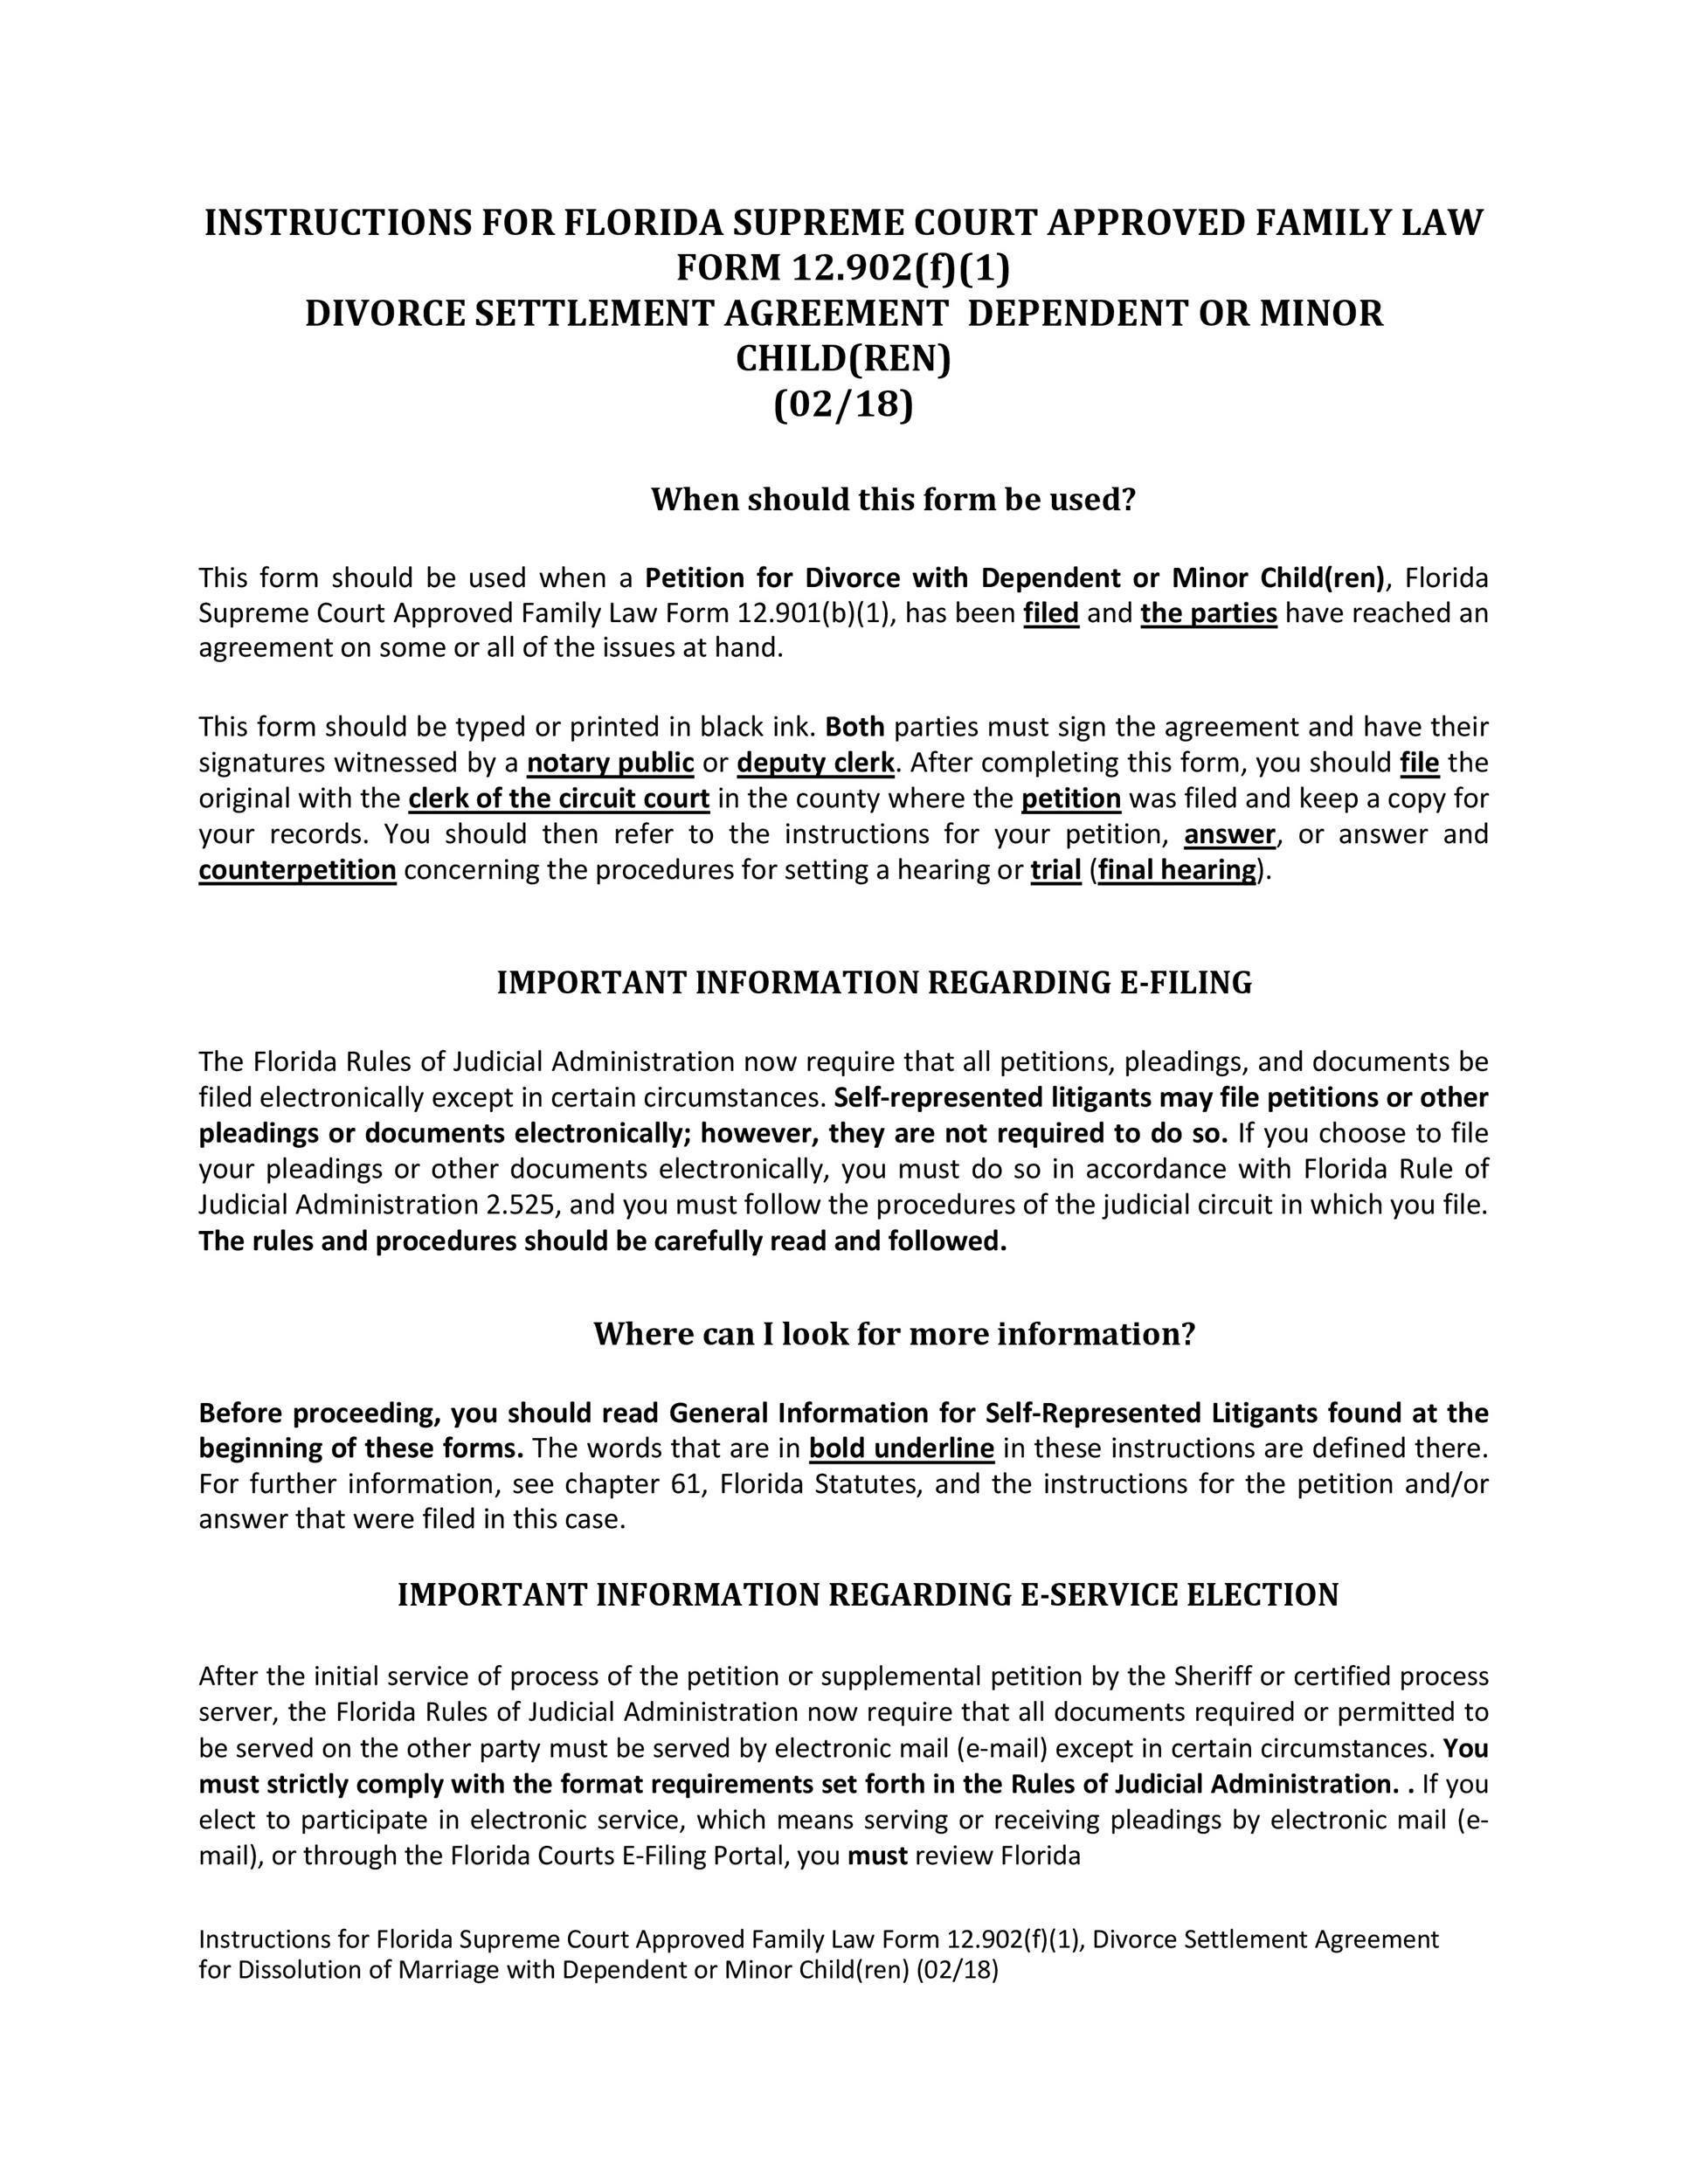 Free divorce agreement 16